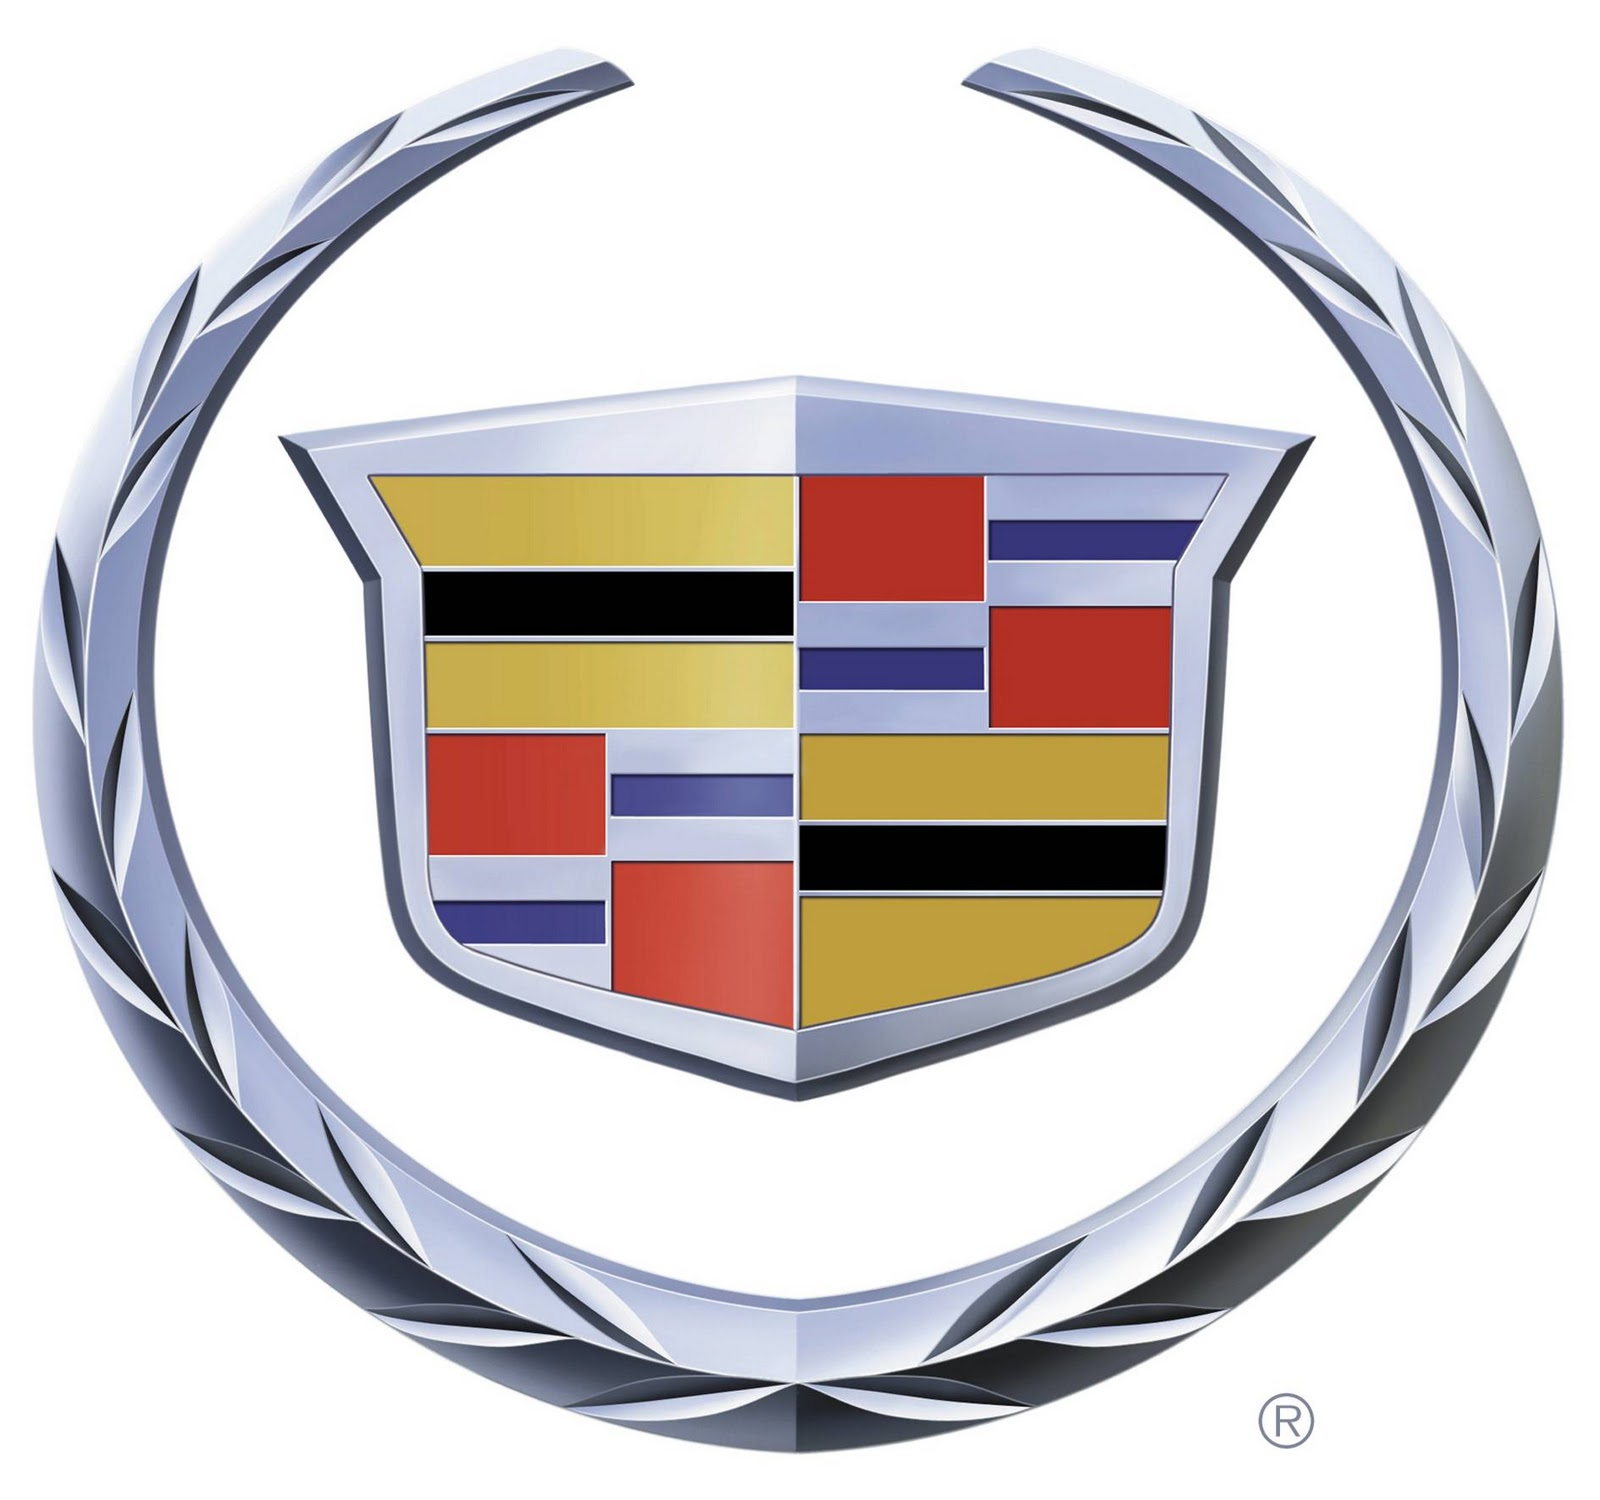 [45+] Cadillac Emblem Wallpaper On WallpaperSafari